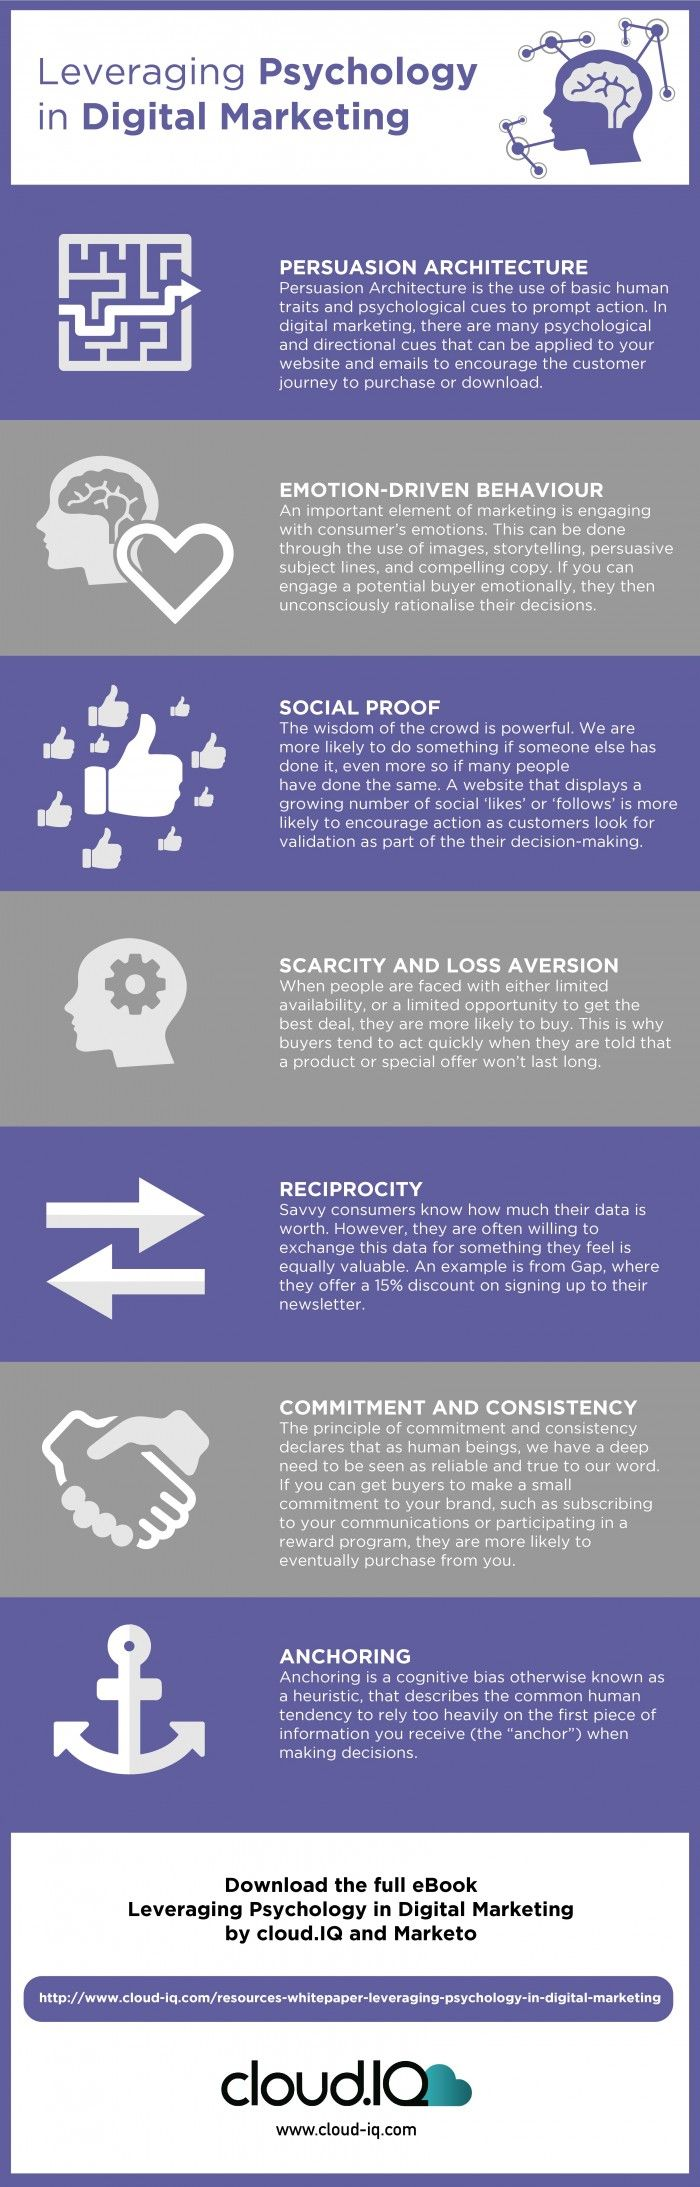 Leveraging Psychology in Digital Marketing infographic